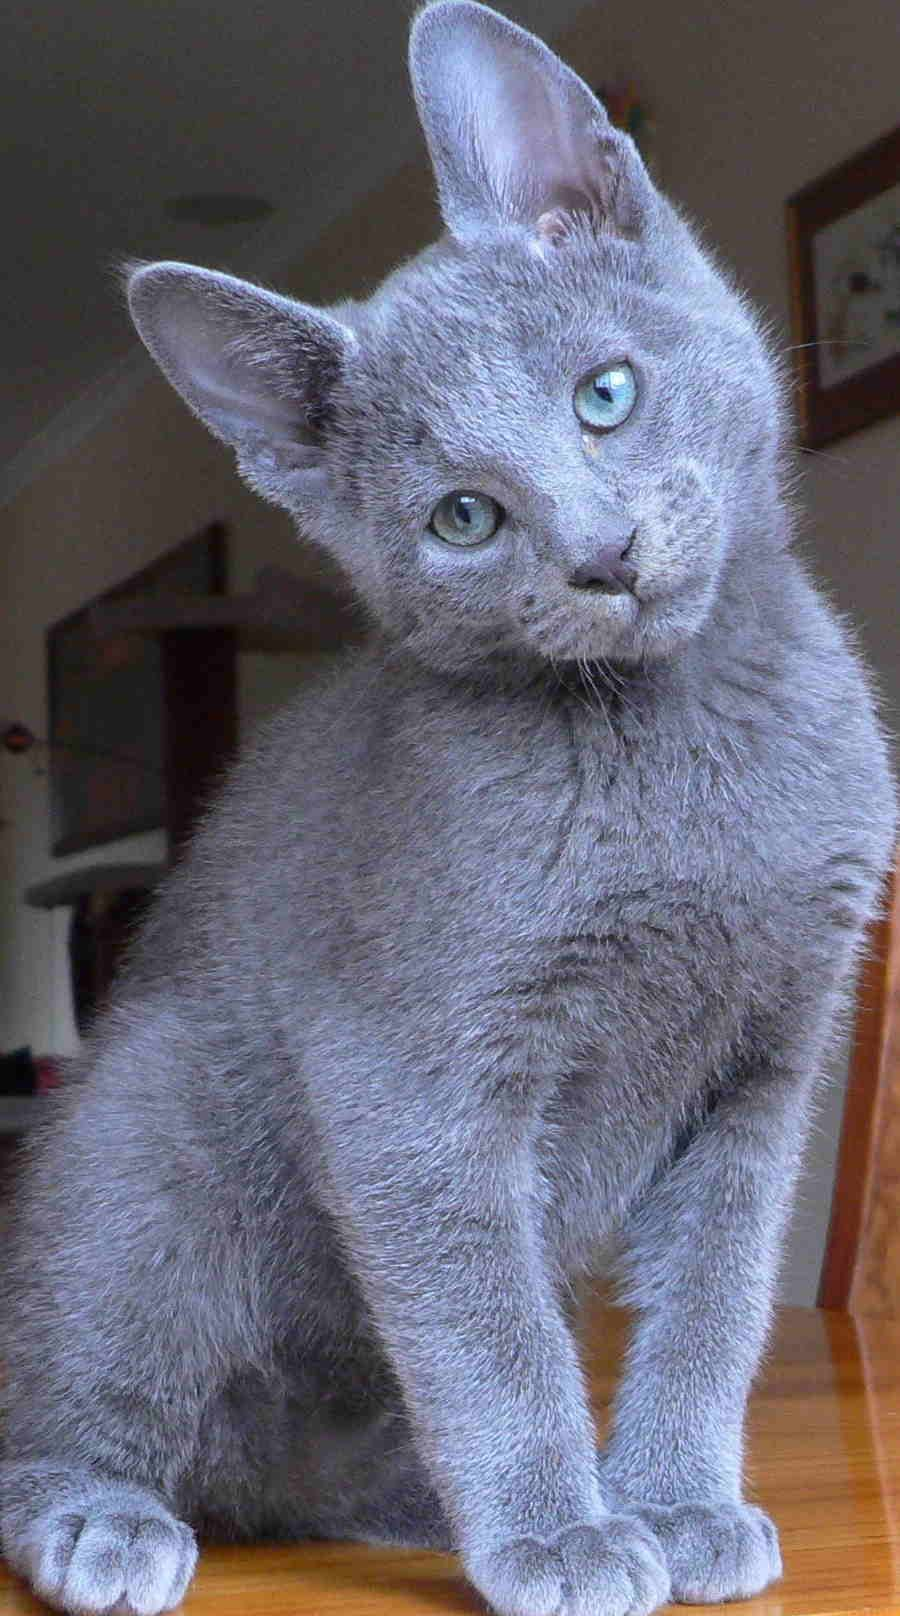 Russian Blue Kitten. I want one like him. I will name him